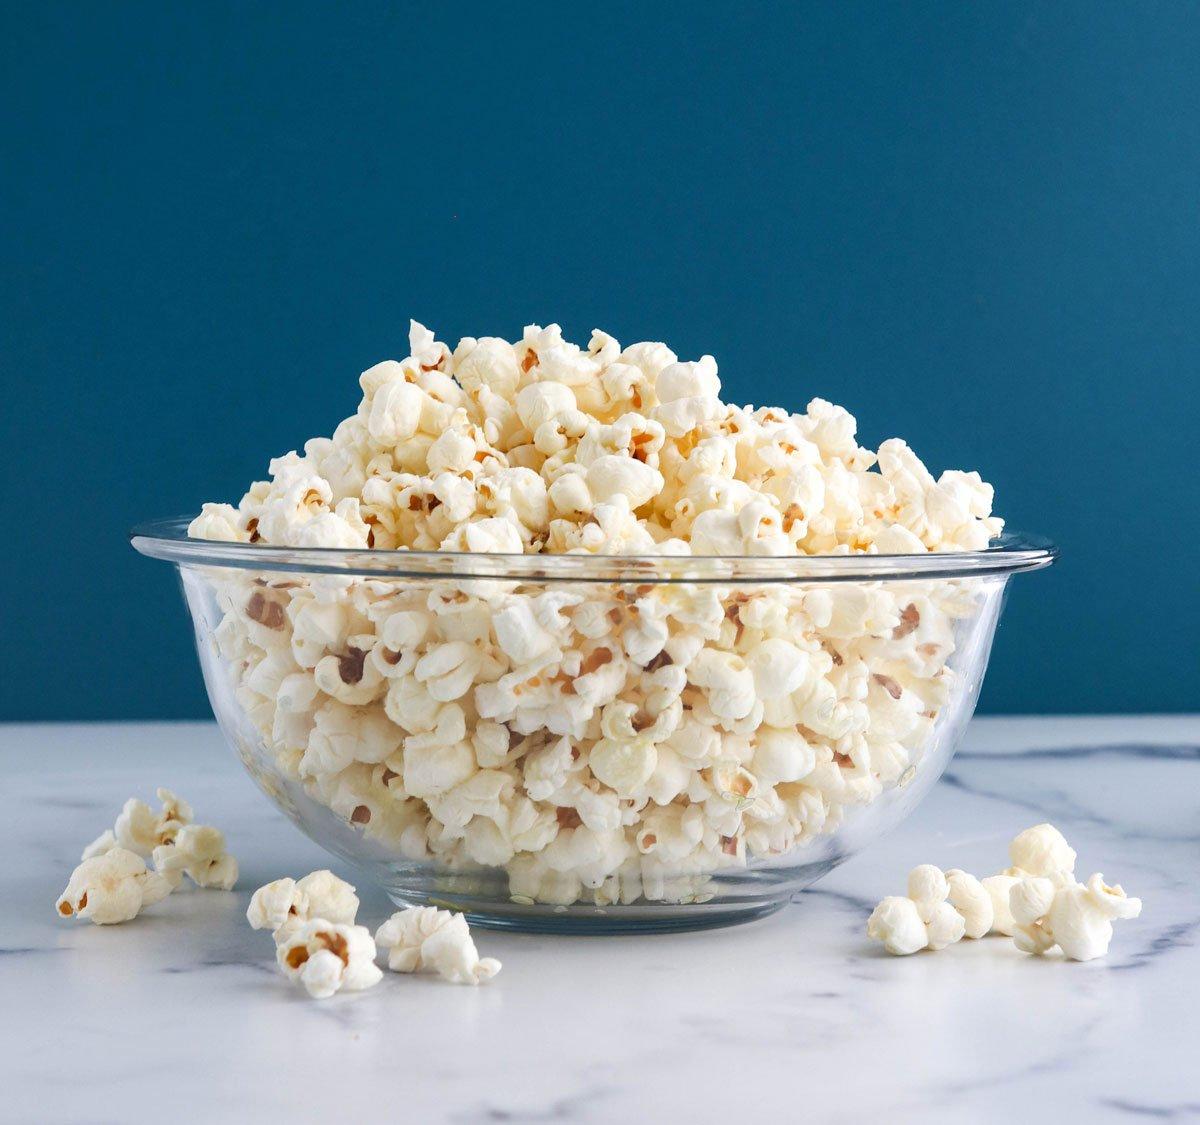 popcorn heaped in glass bowl